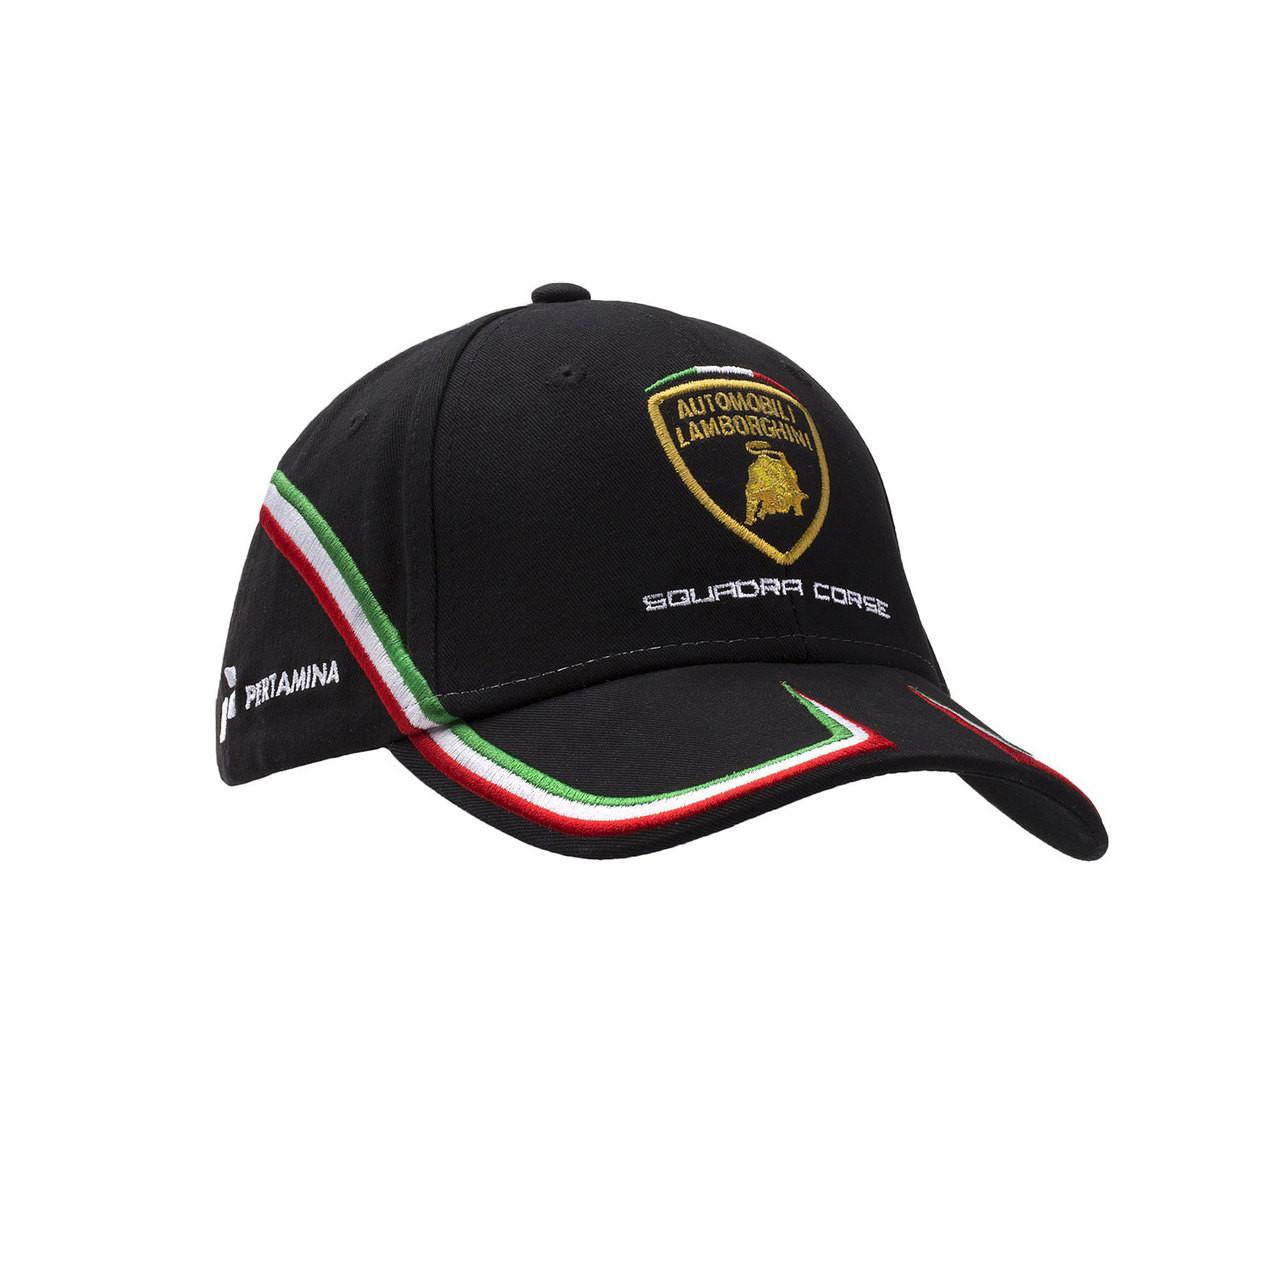 Lamborghini Squadra Corse Hat In Black Italian Exotics Boutique